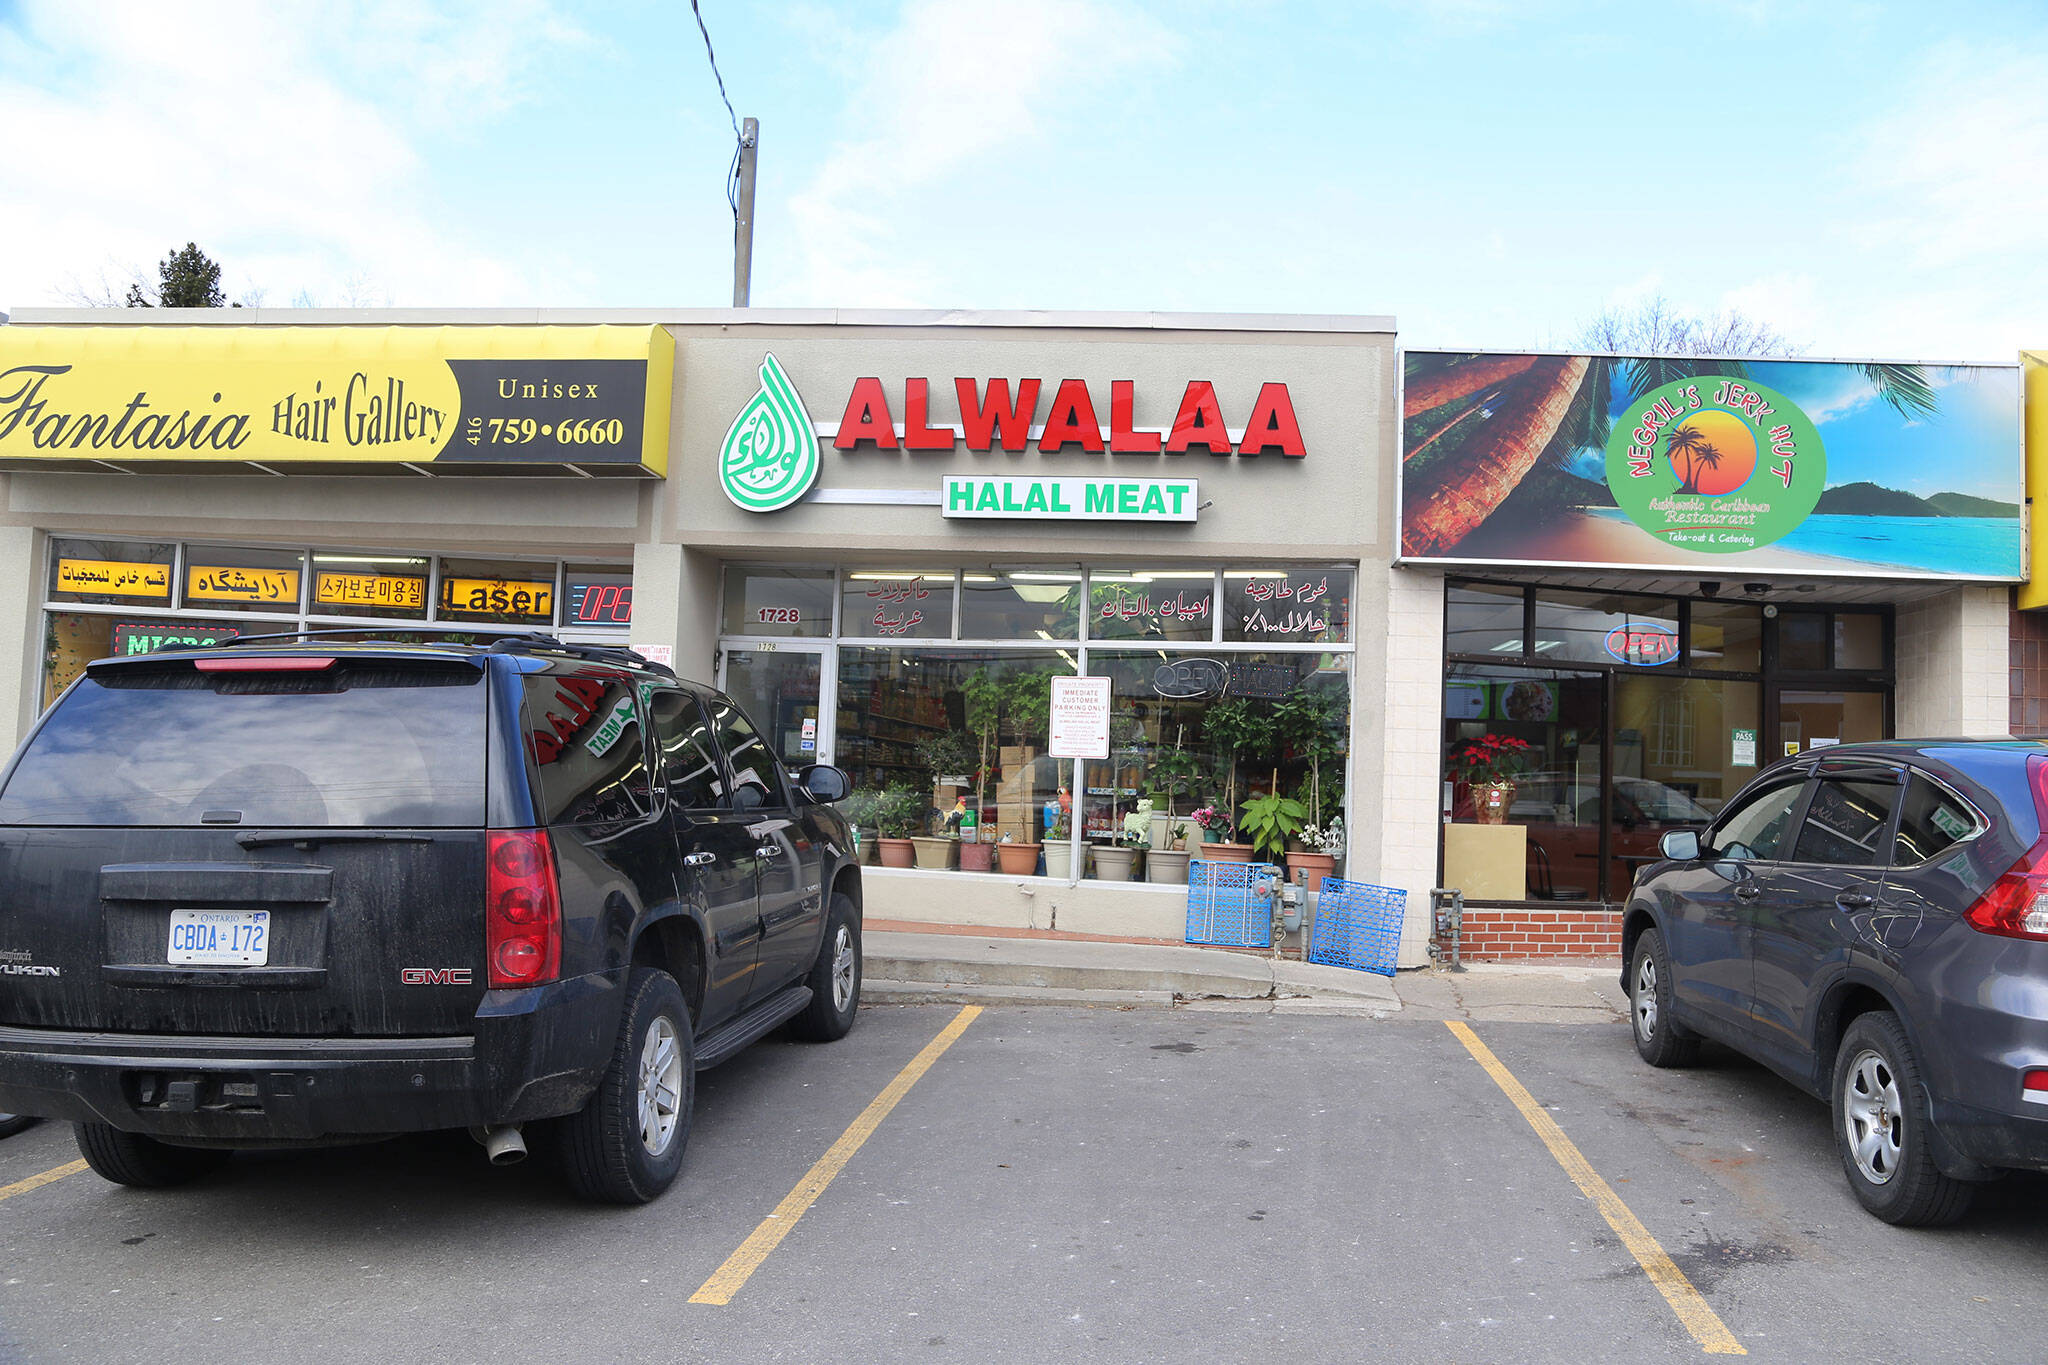 Al Walaa Toronto